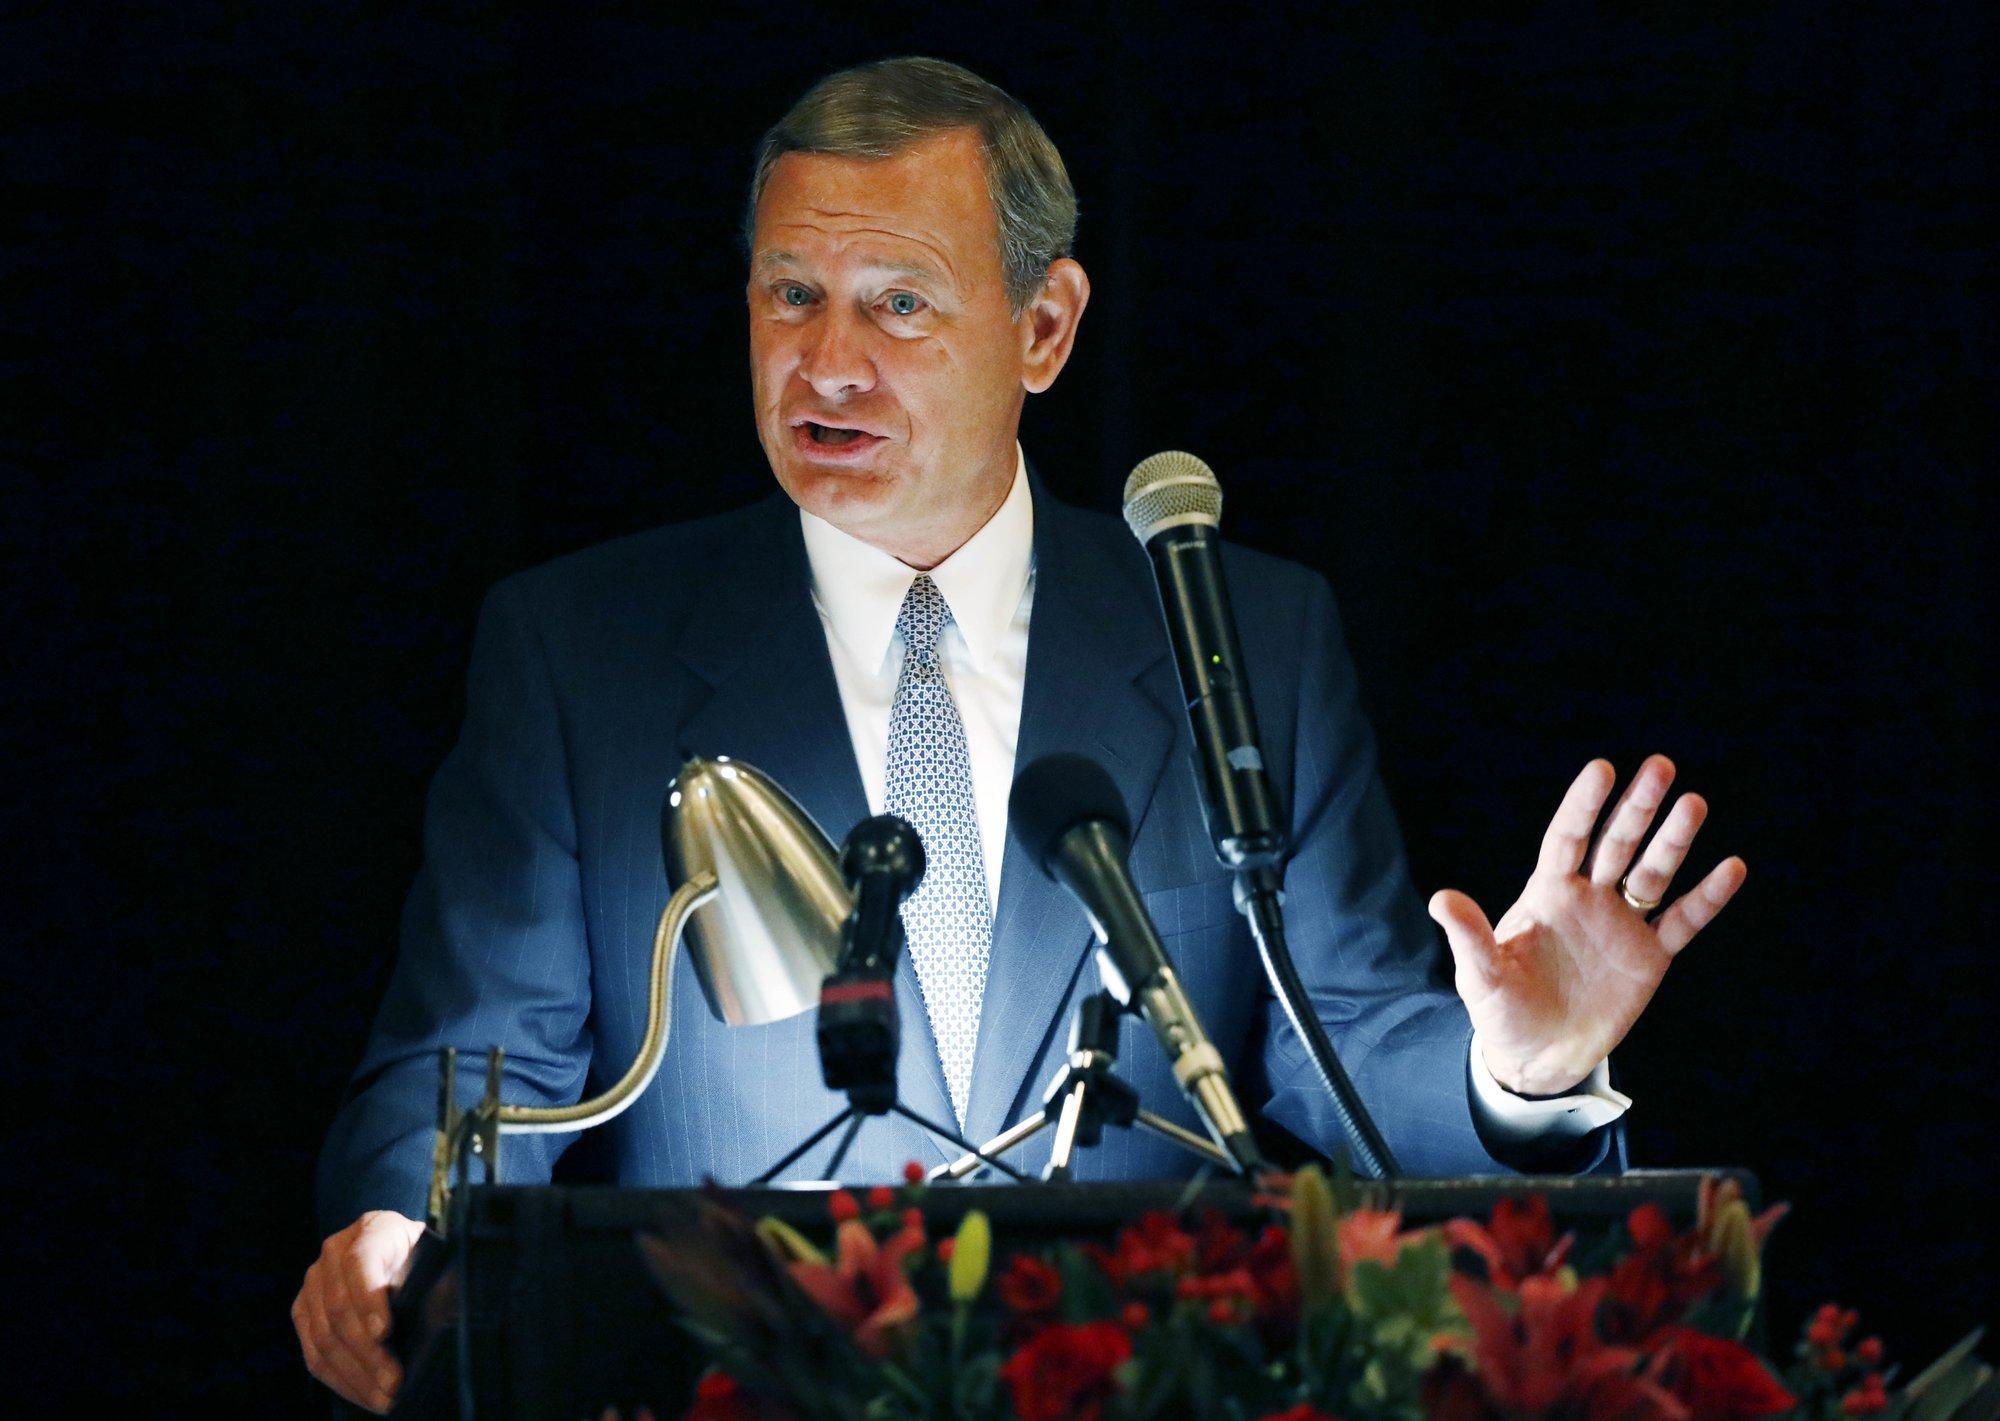 Roberts, Trump spar in extraordinary scrap over judges